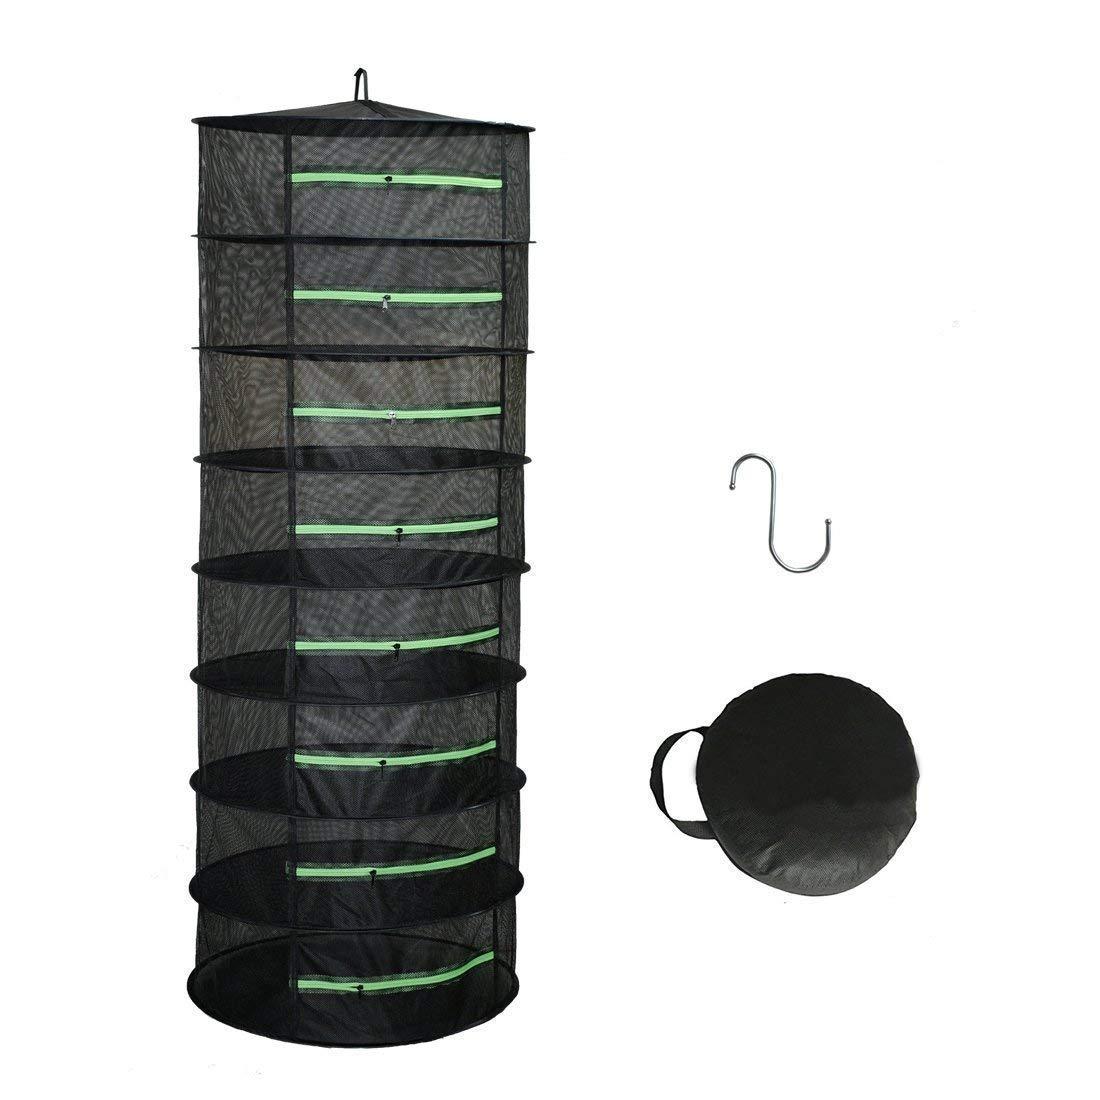 Hydgooho Herb Drying Rack 8 Layer Dryer 2ft Black Mesh Green Zipper